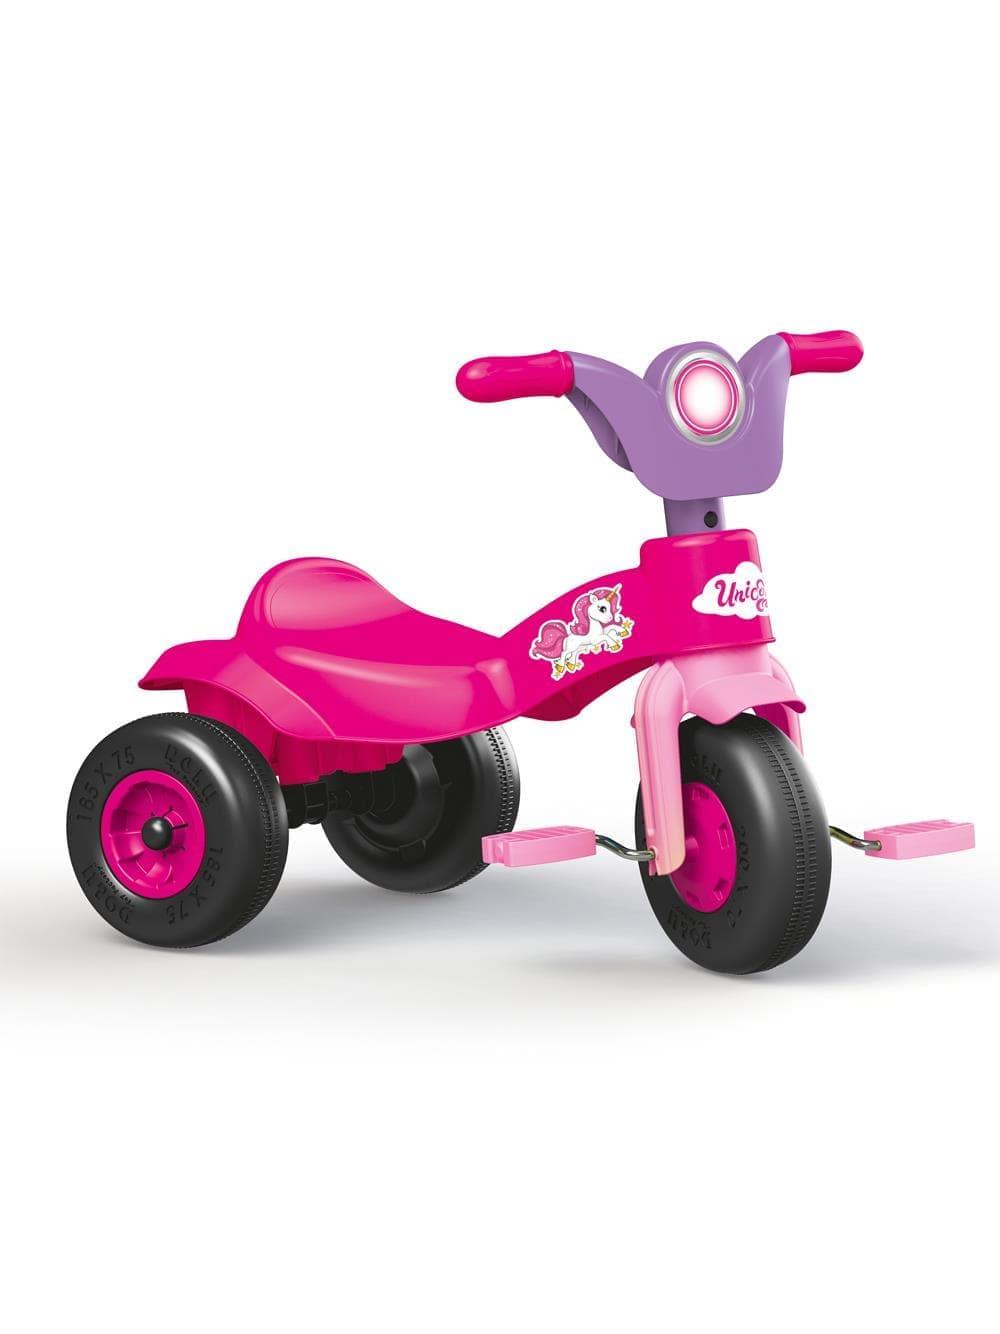 Dolu Τρίκυκλο Ποδήλατο Ροζ - Παιδικά Ποδήλατα